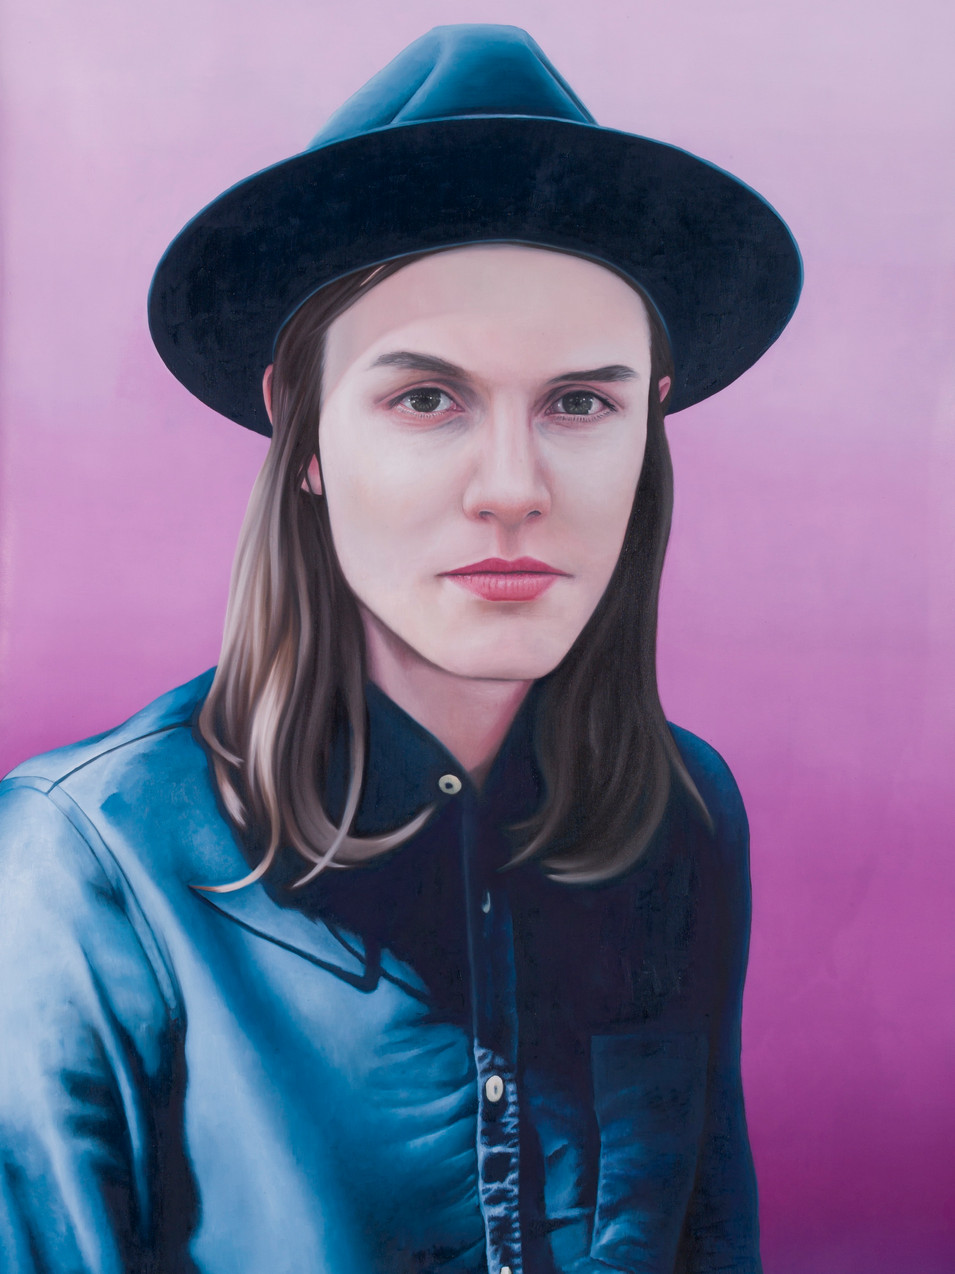 Michael Klipphahn | Boy | 2015 | Öl auf Papier | 100 x 70 cm